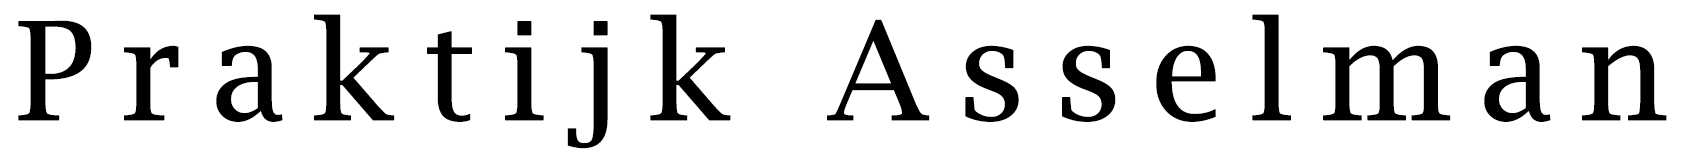 Praktijk Asselman